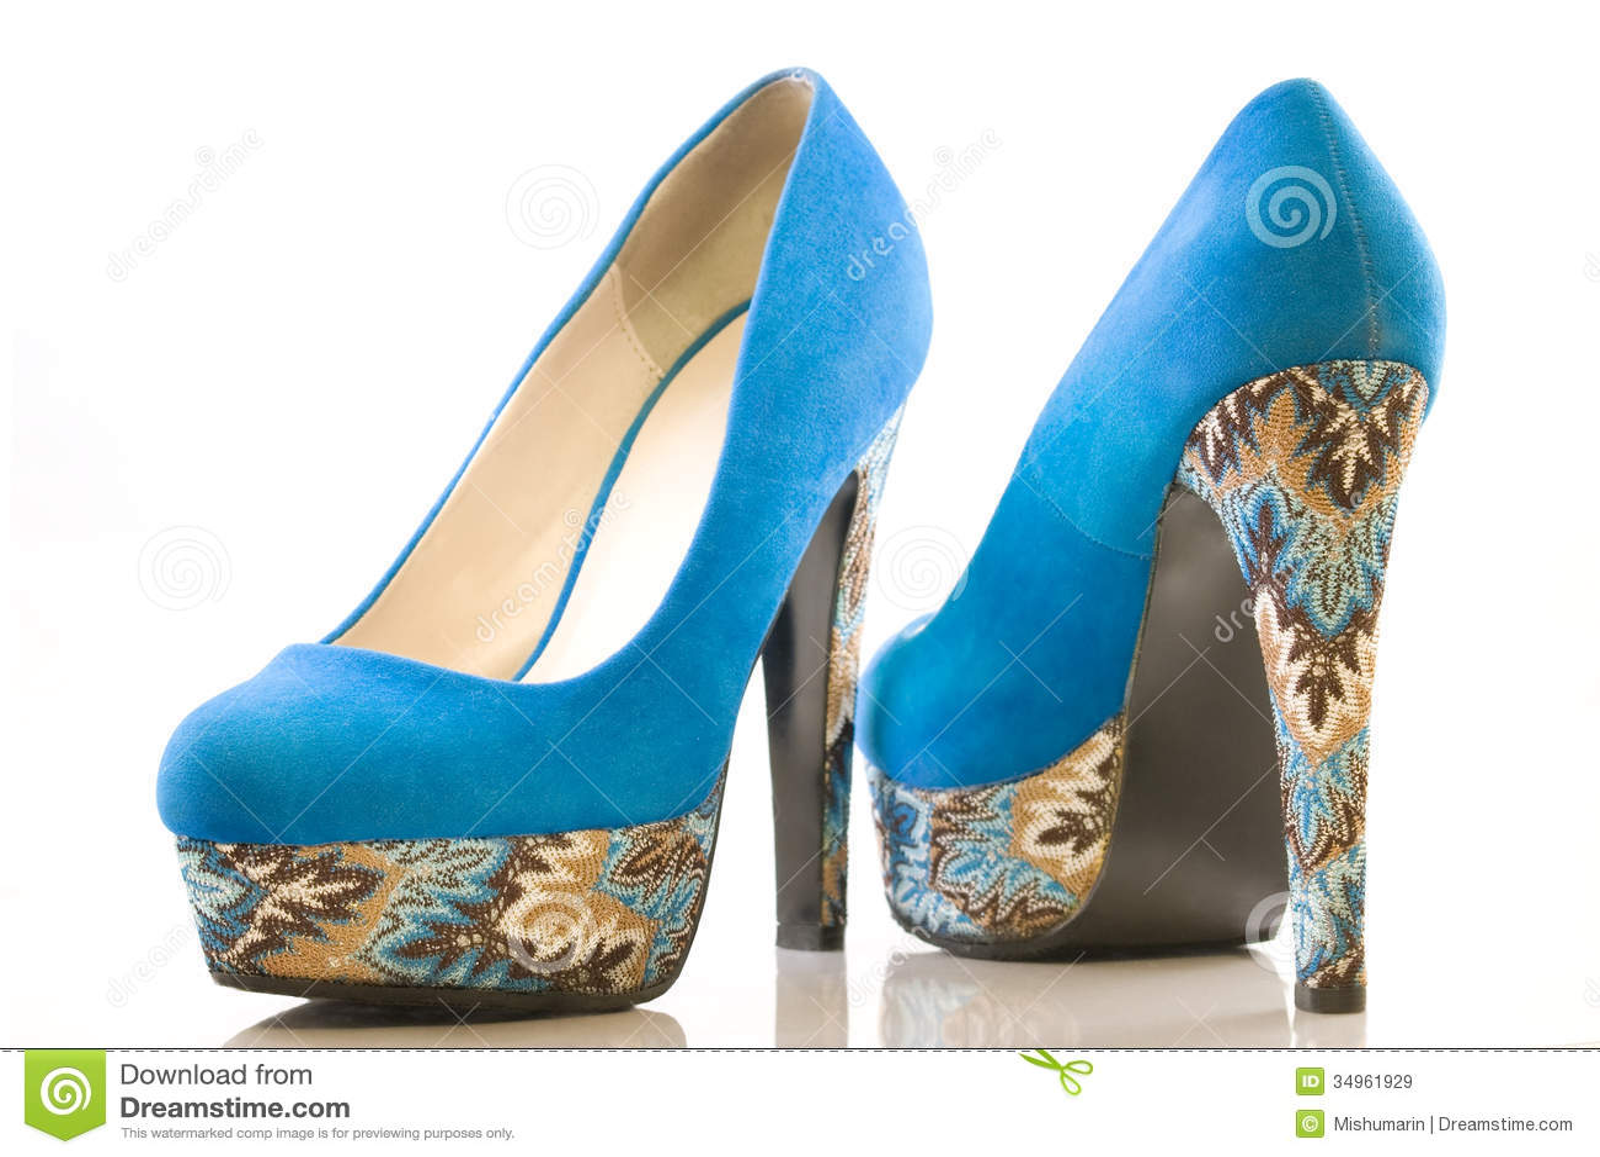 Blue Shoes High Heels